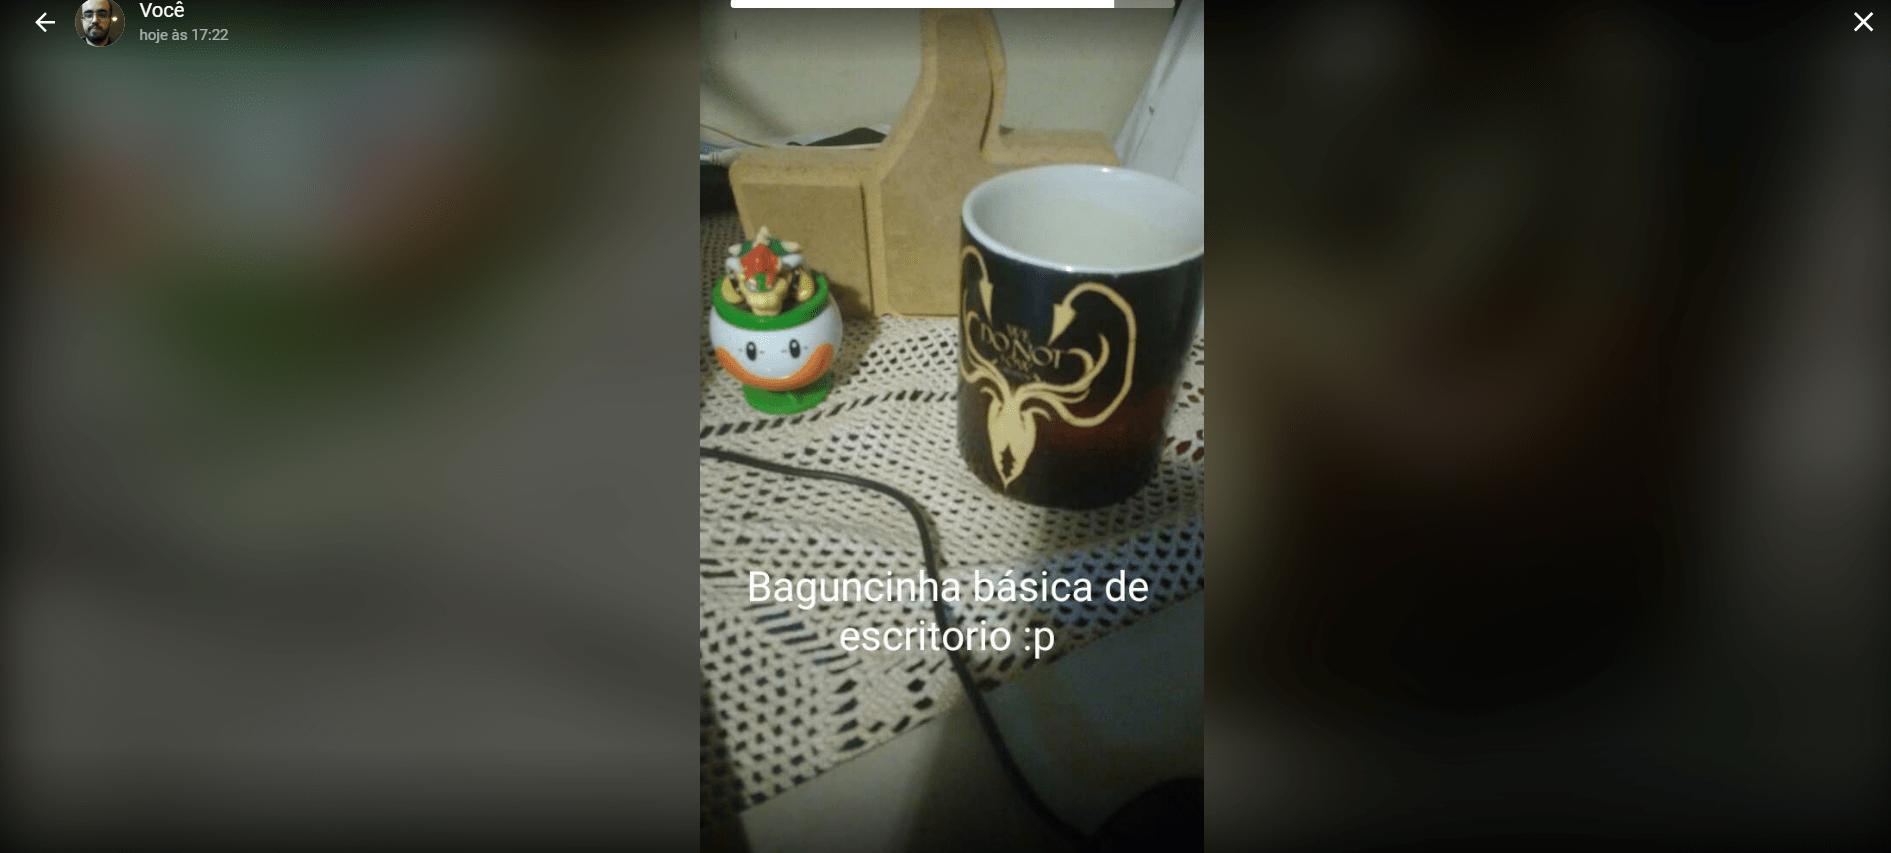 status-whatsapp-pc-visualizacao